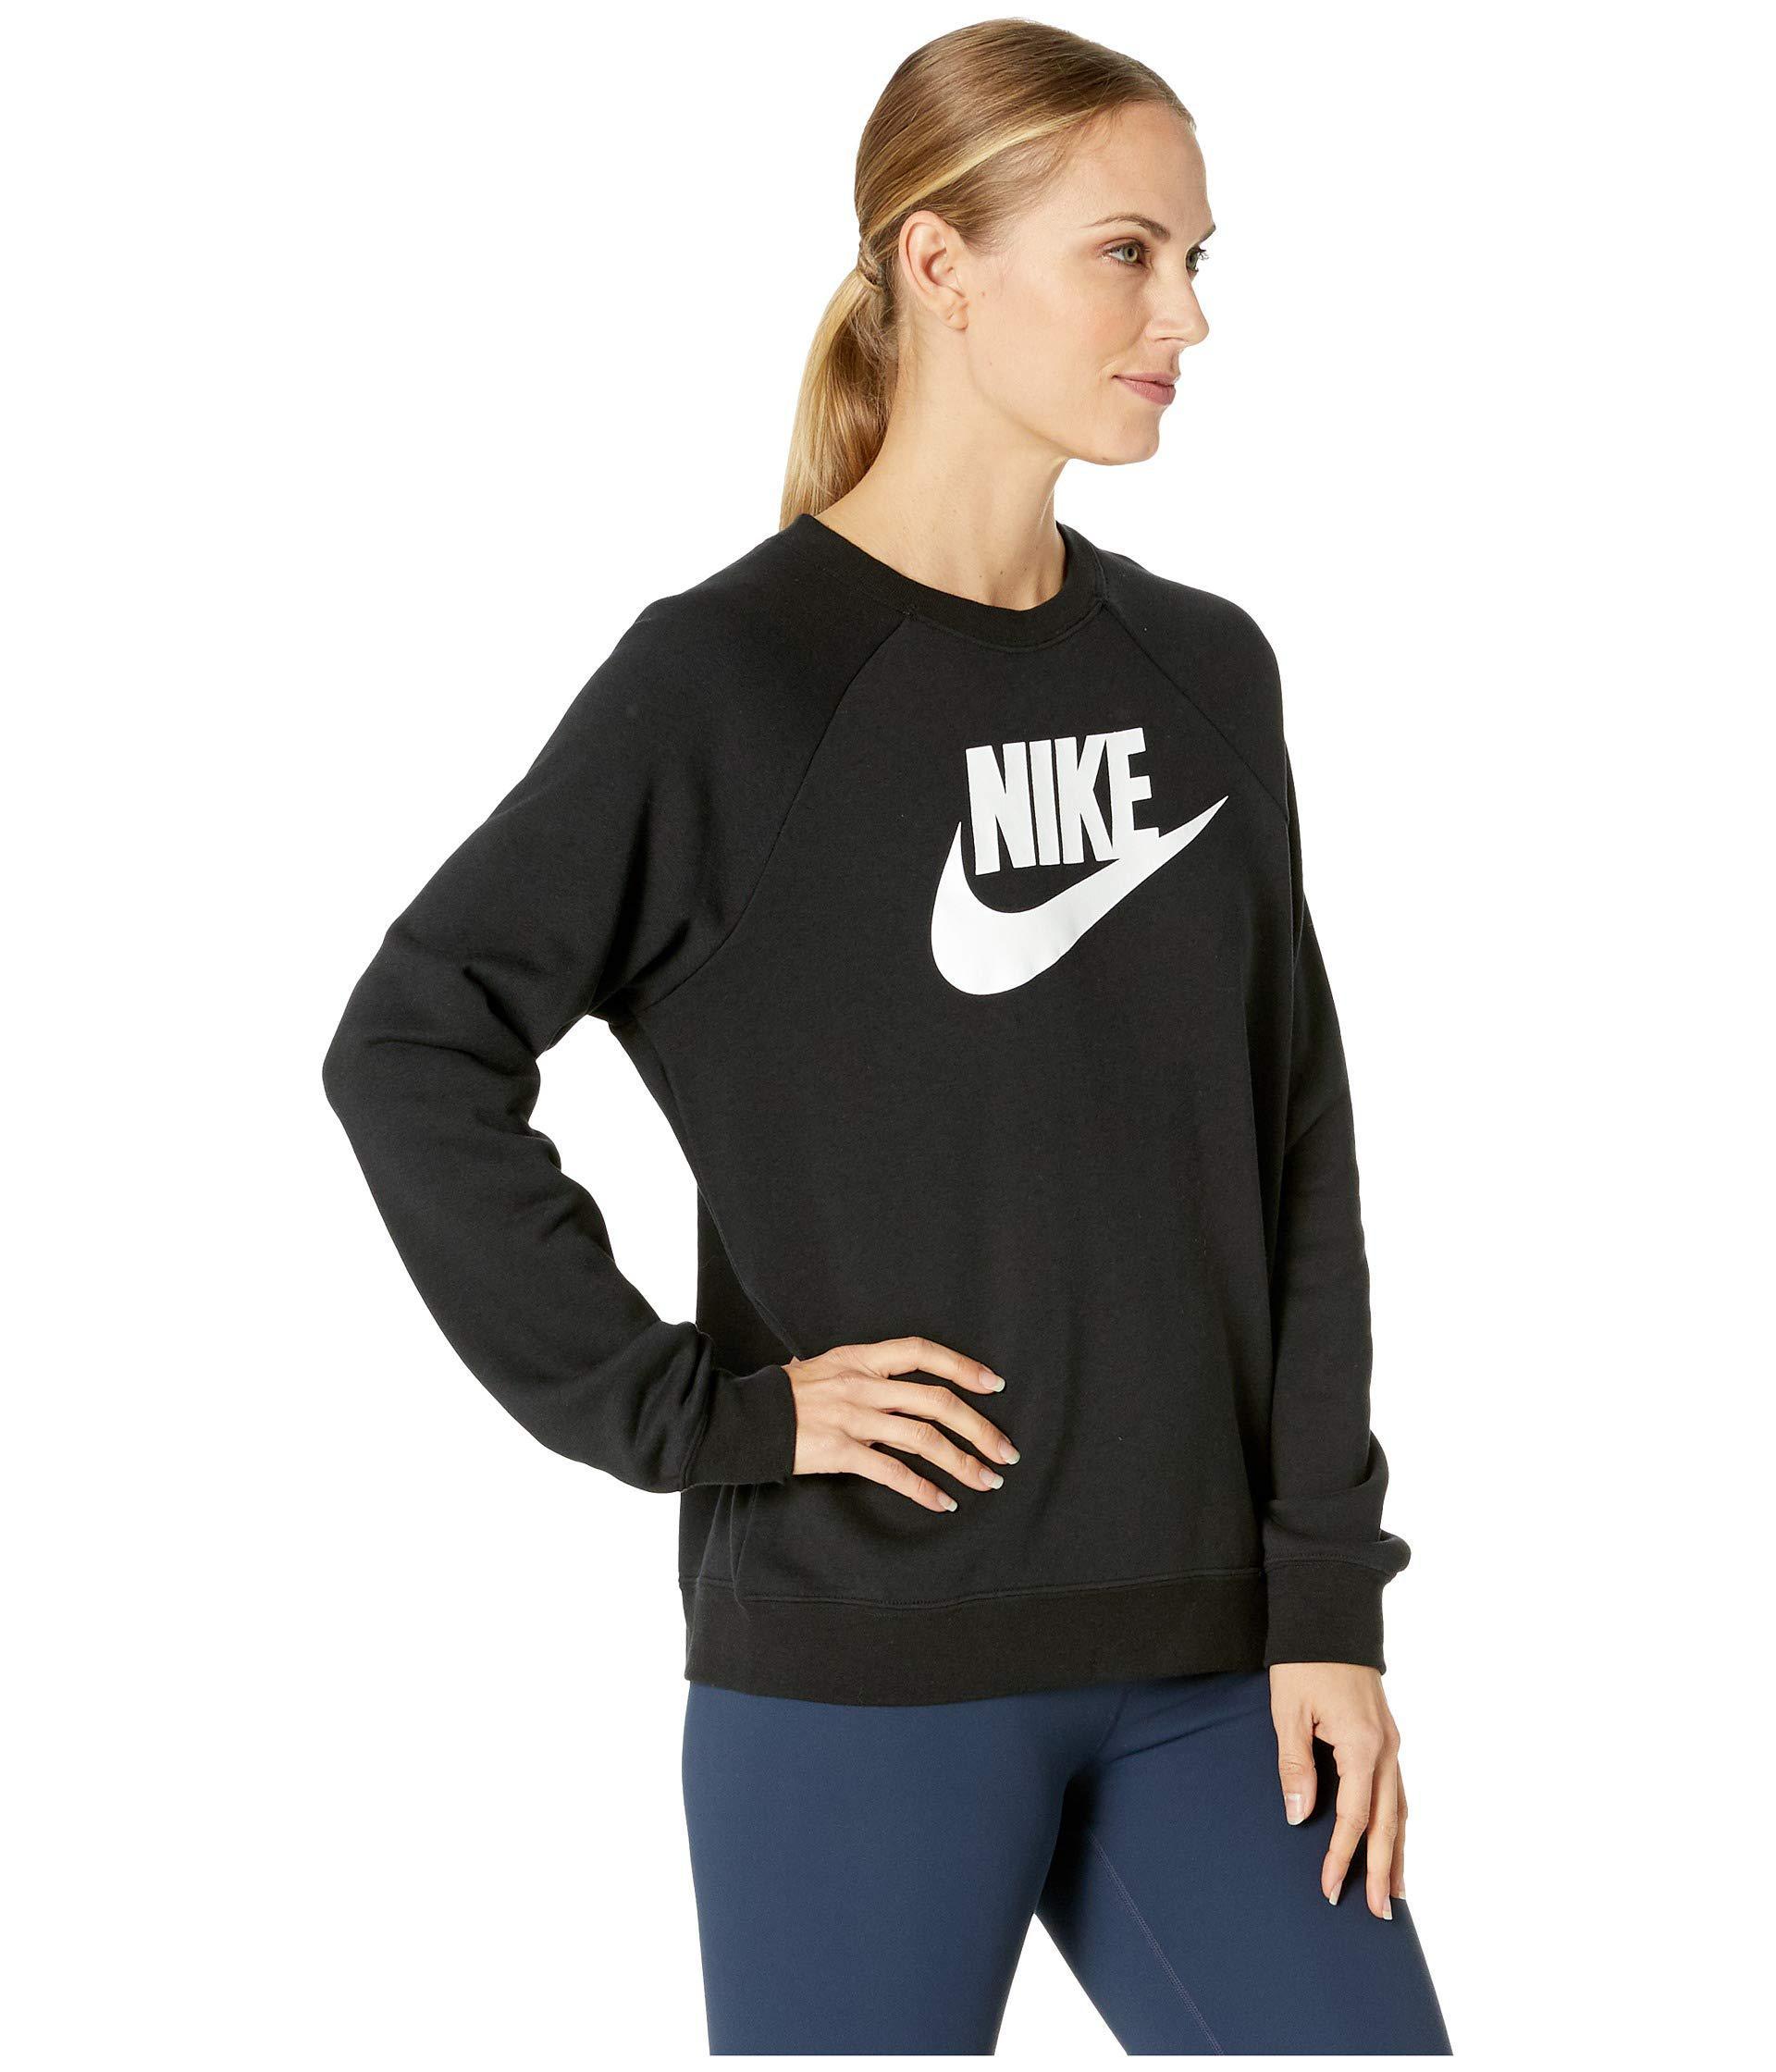 d9f1cf8cc5dd Lyst - Nike Rally Crew Hbr (black white) Women s Long Sleeve ...